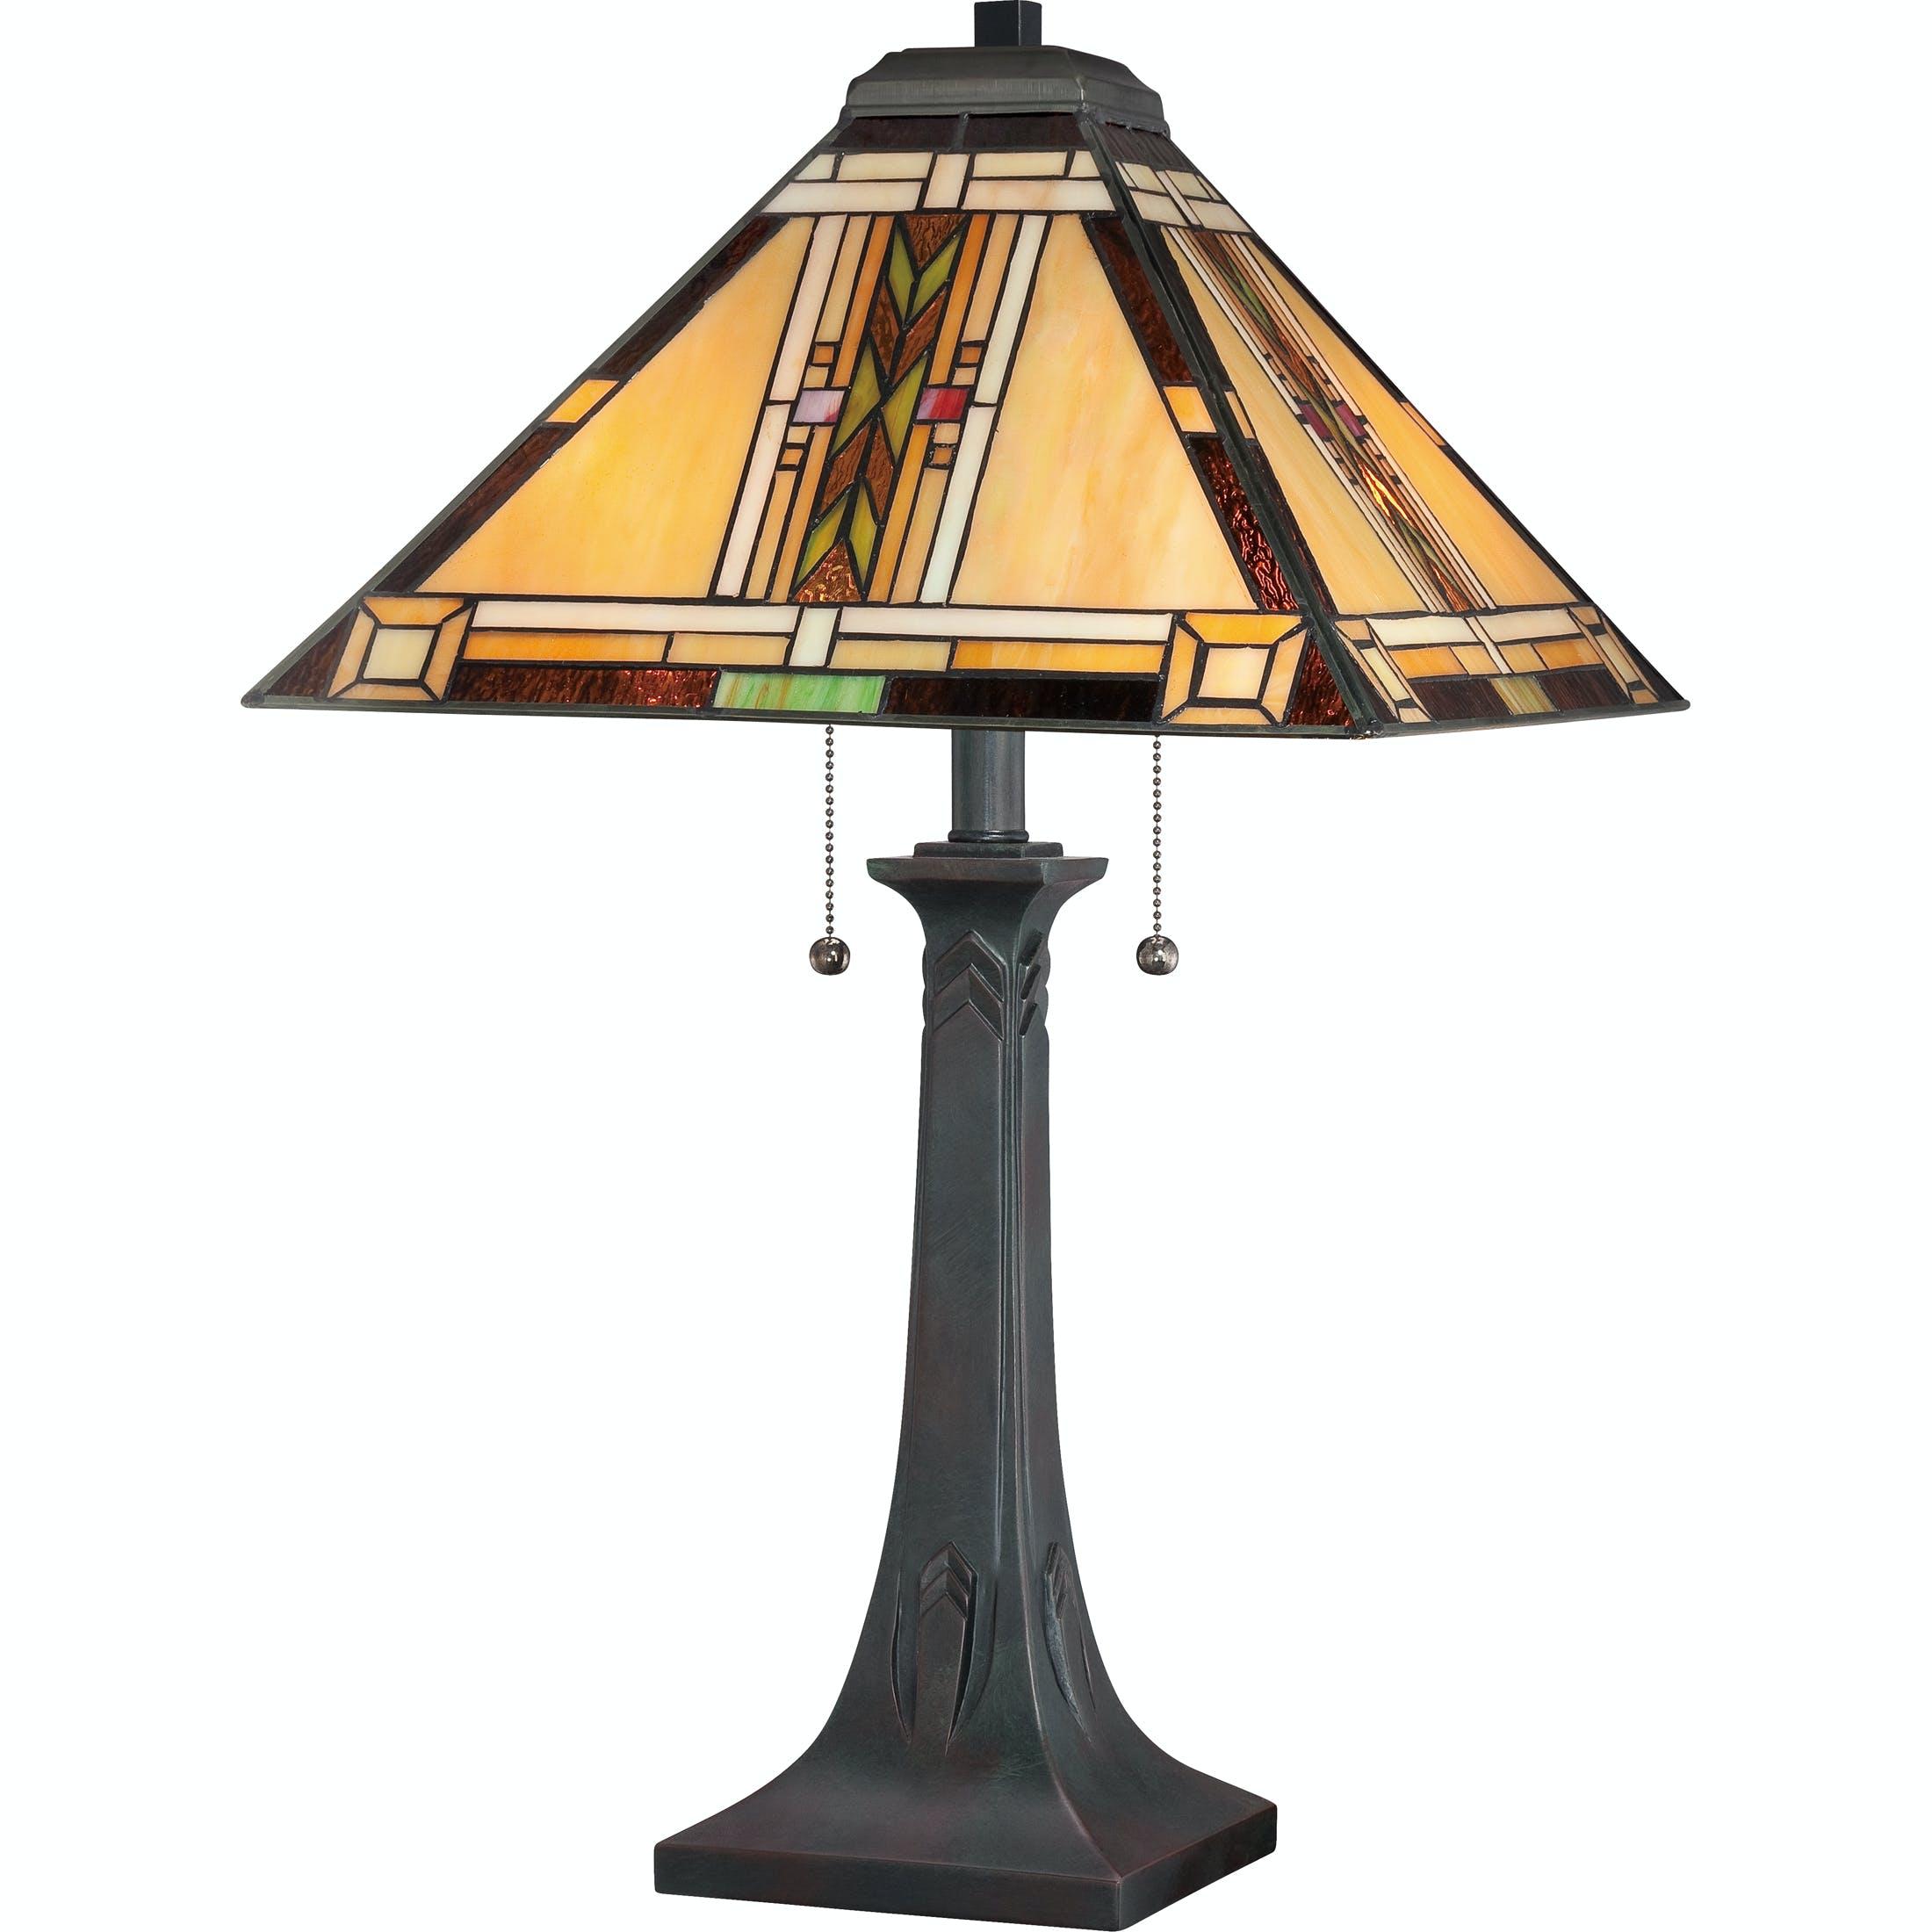 Quoizel Lamps And Lighting Navajo Table Lamp Tfno6325va Mark Thomas Home Santa Clara Ca